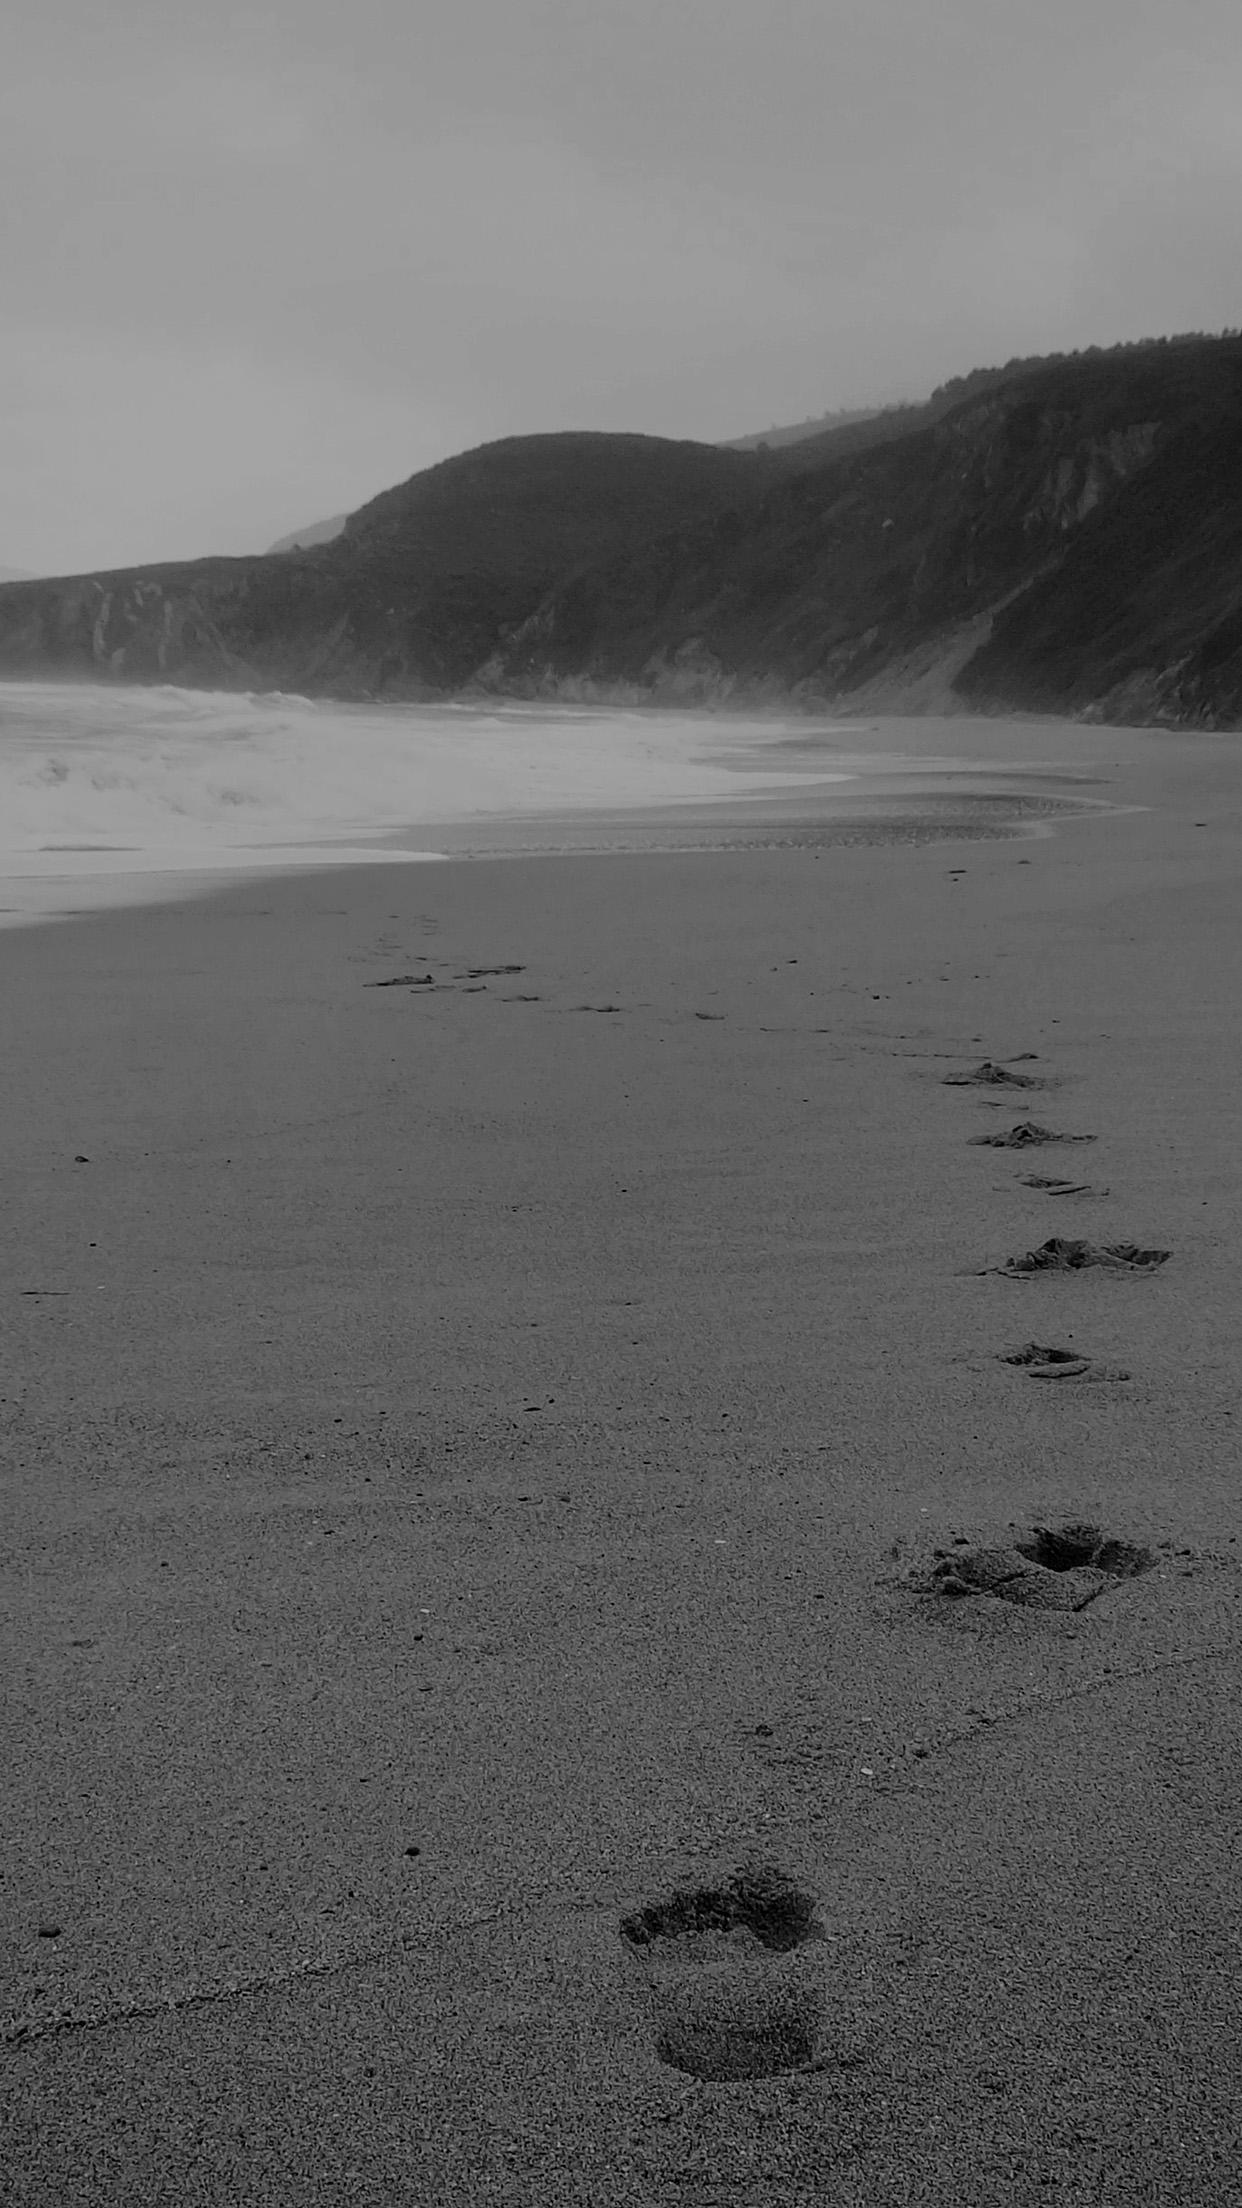 Beach Naked walk 3Wallpapers iPhone Parallax 3Wallpapers : notre sélection de fonds d'écran du 02/12/2016